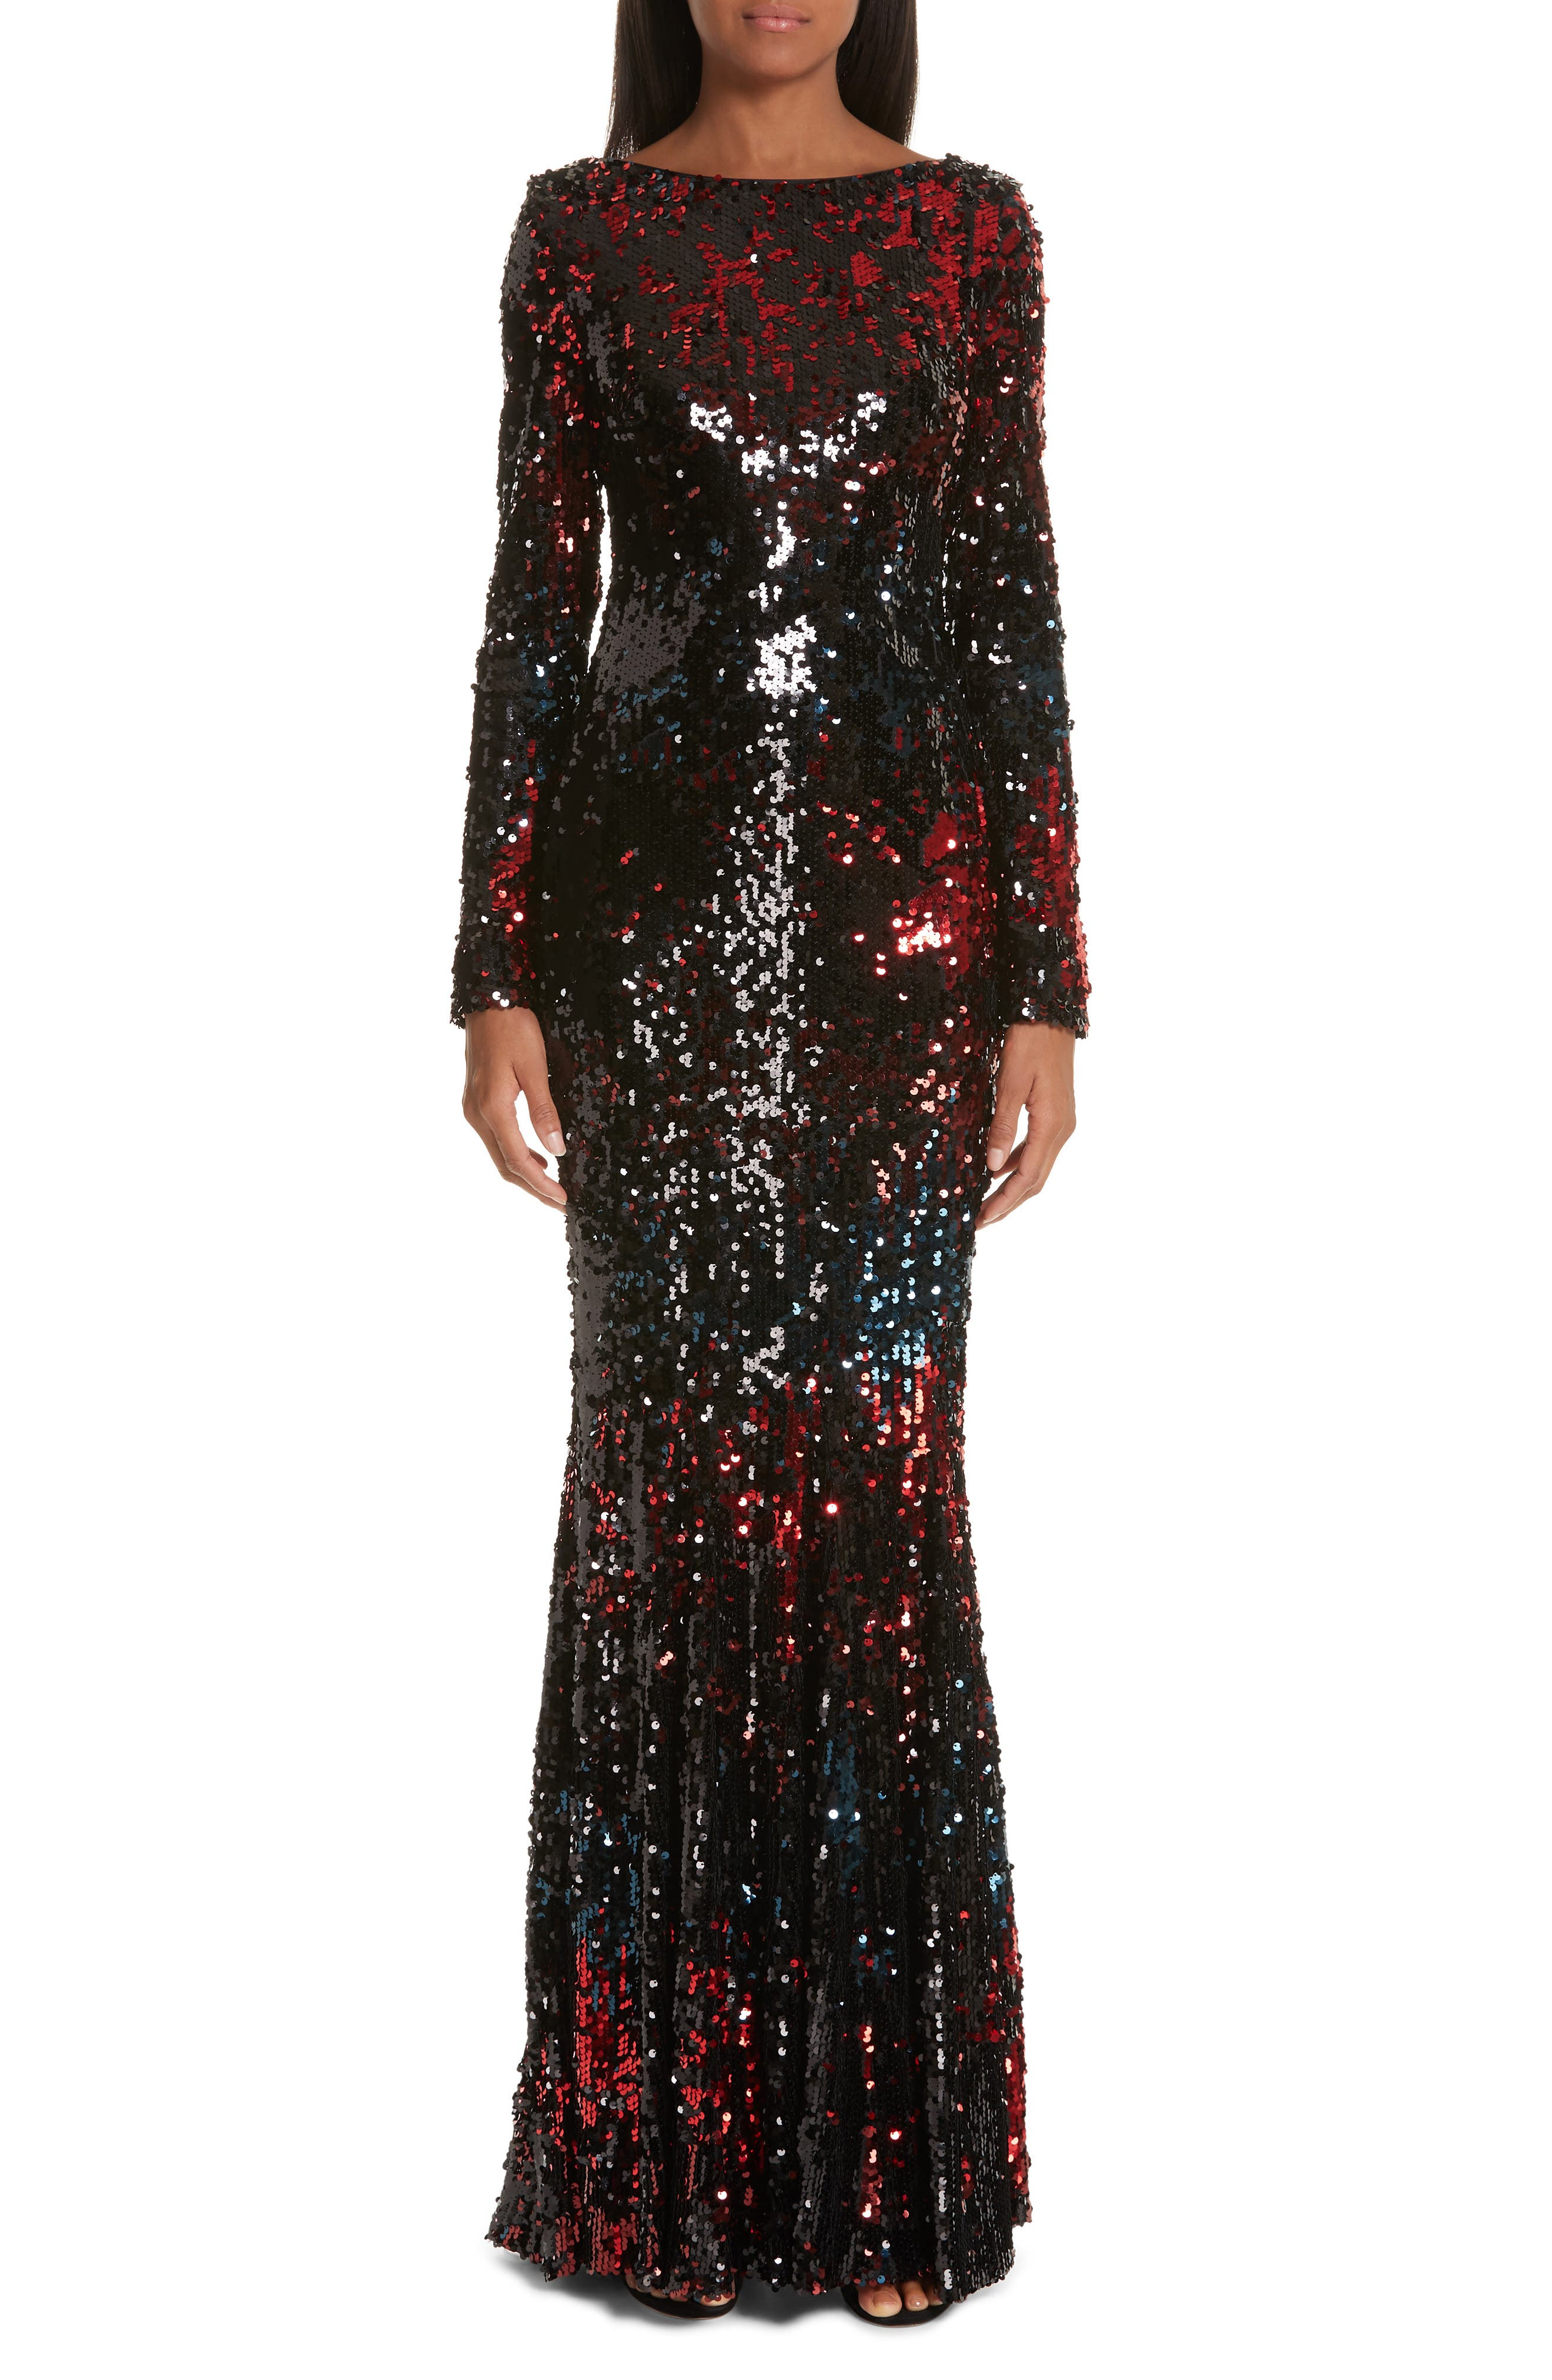 Talbot Runhof Vulcano Sequin Evening Dress, Black